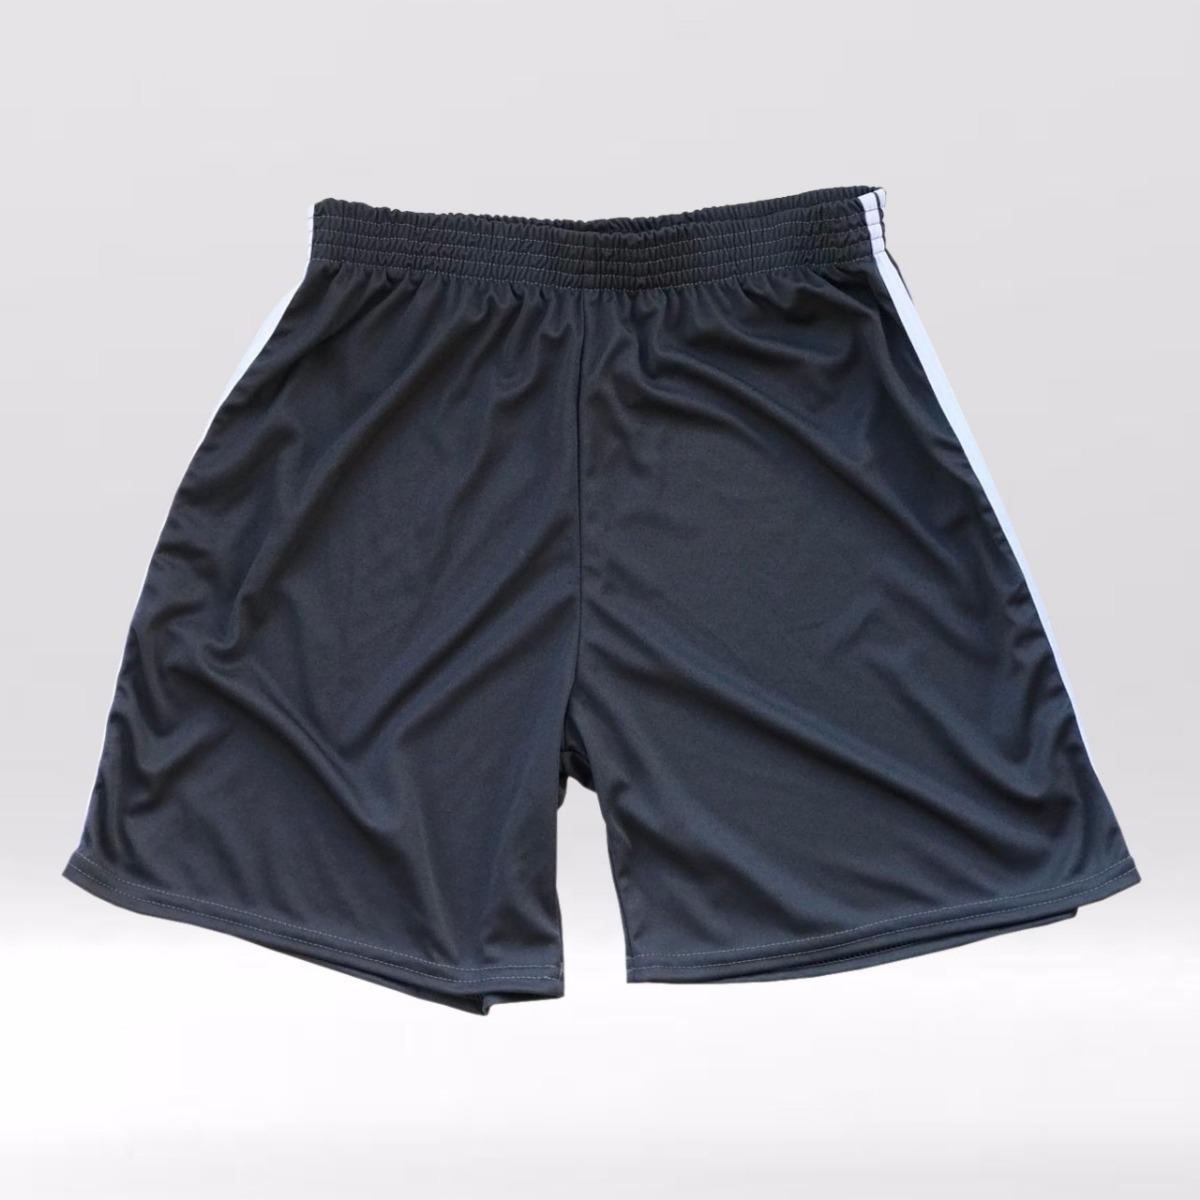 kit10 calção short masculino plus size futebol esporte futsa. Carregando  zoom. b50b5546c6514